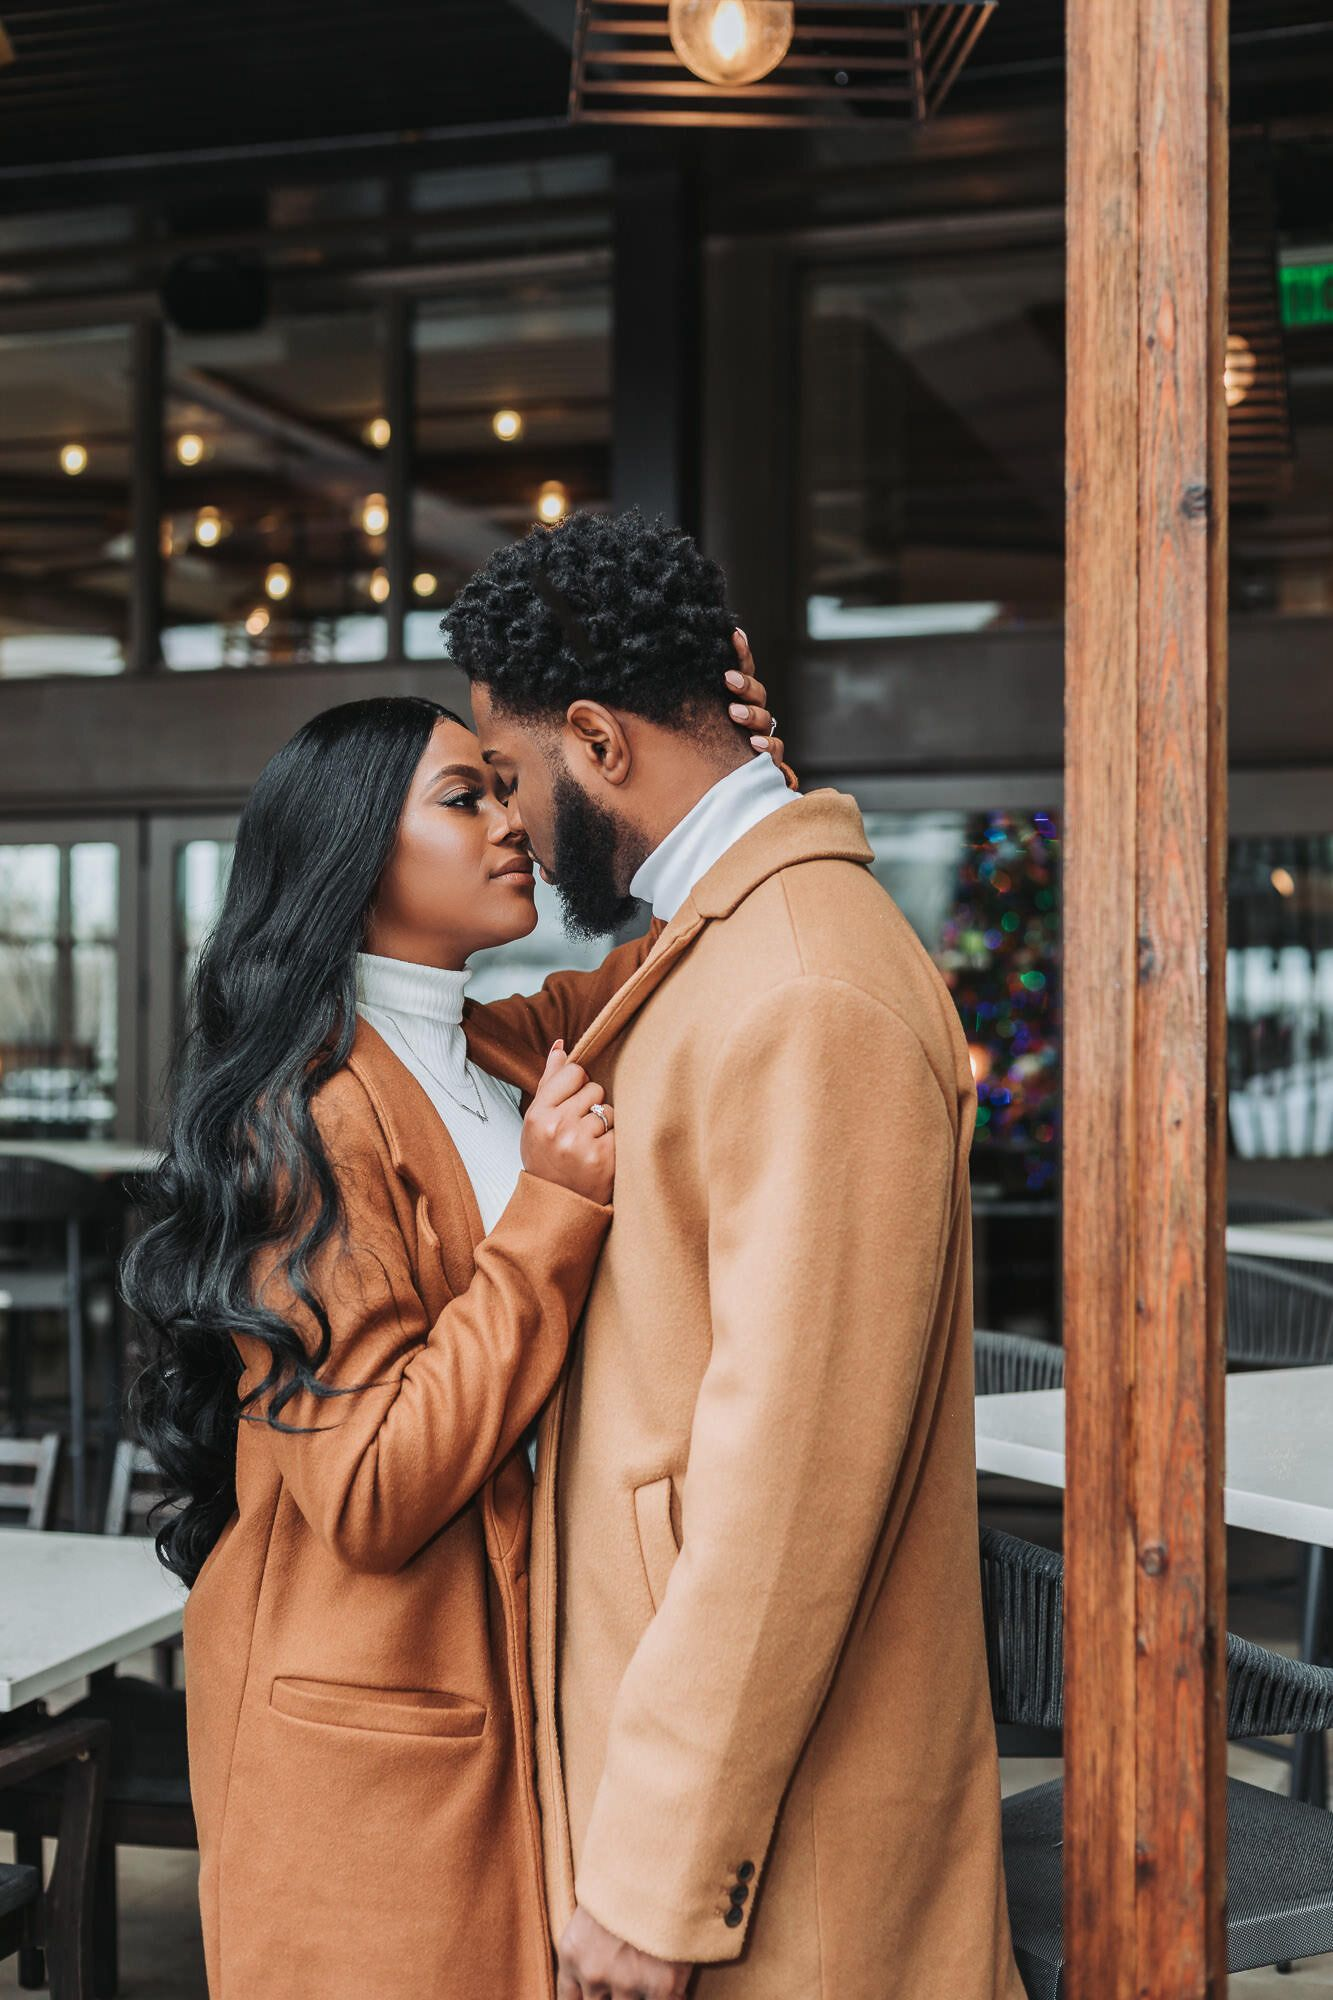 St. Louis Wedding Photographer -   17 christmas photoshoot couples black ideas